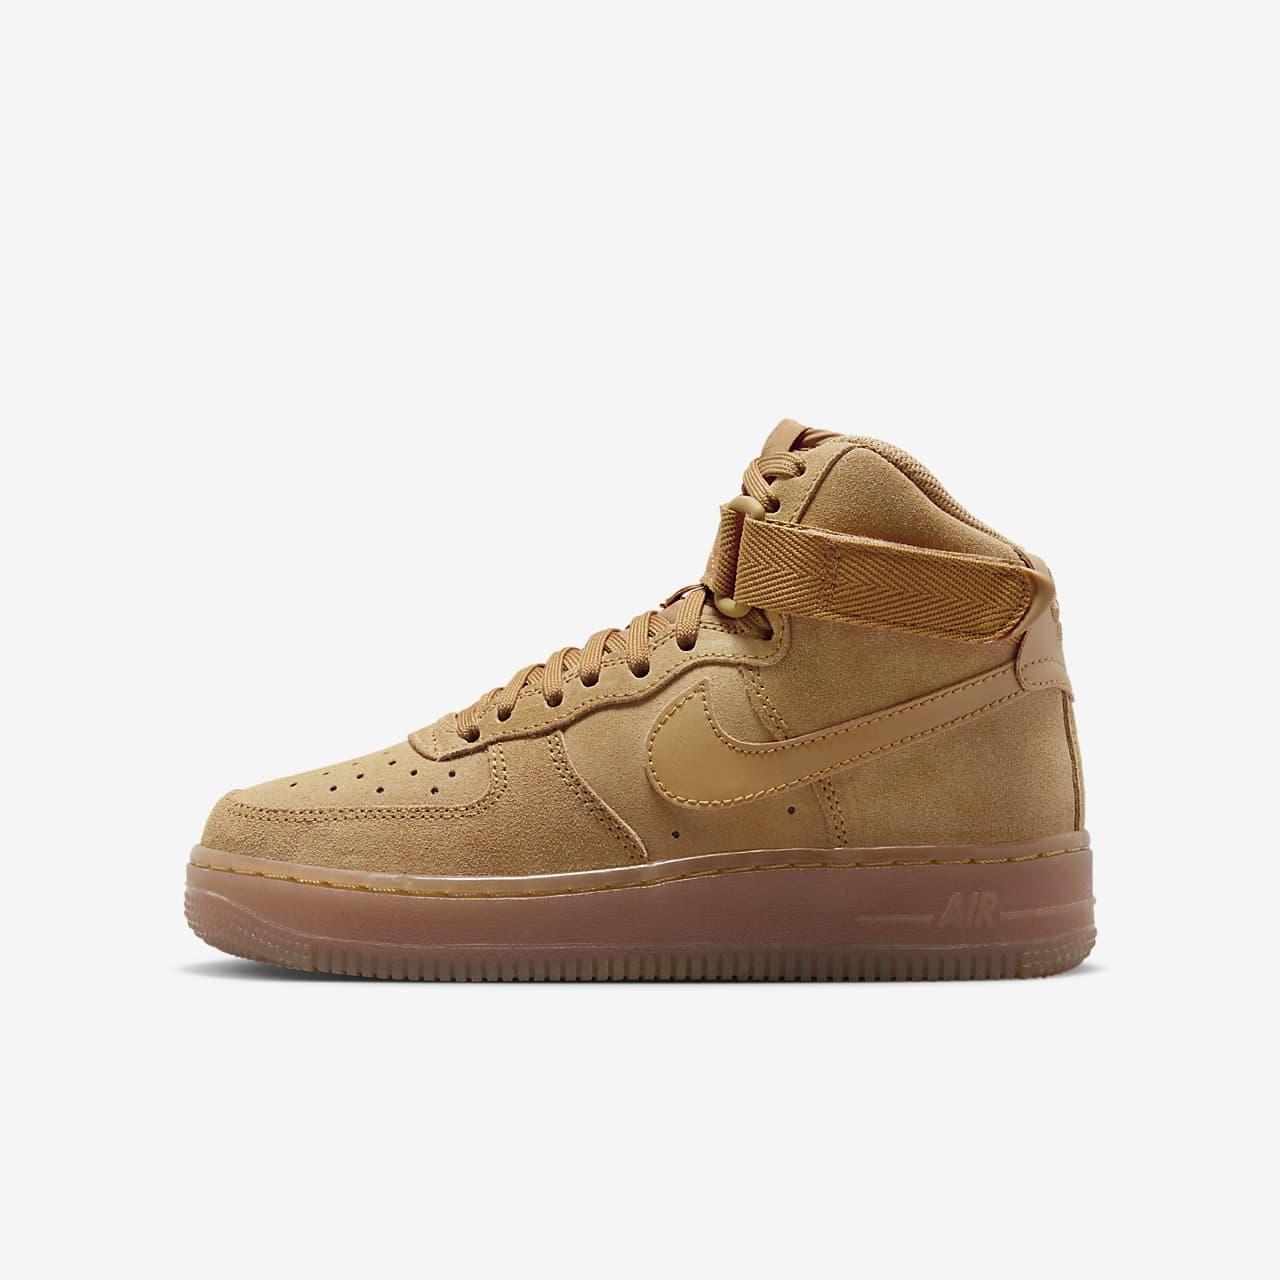 Nike Air Force 1 High LV8 3 (GS) 大童运动童鞋